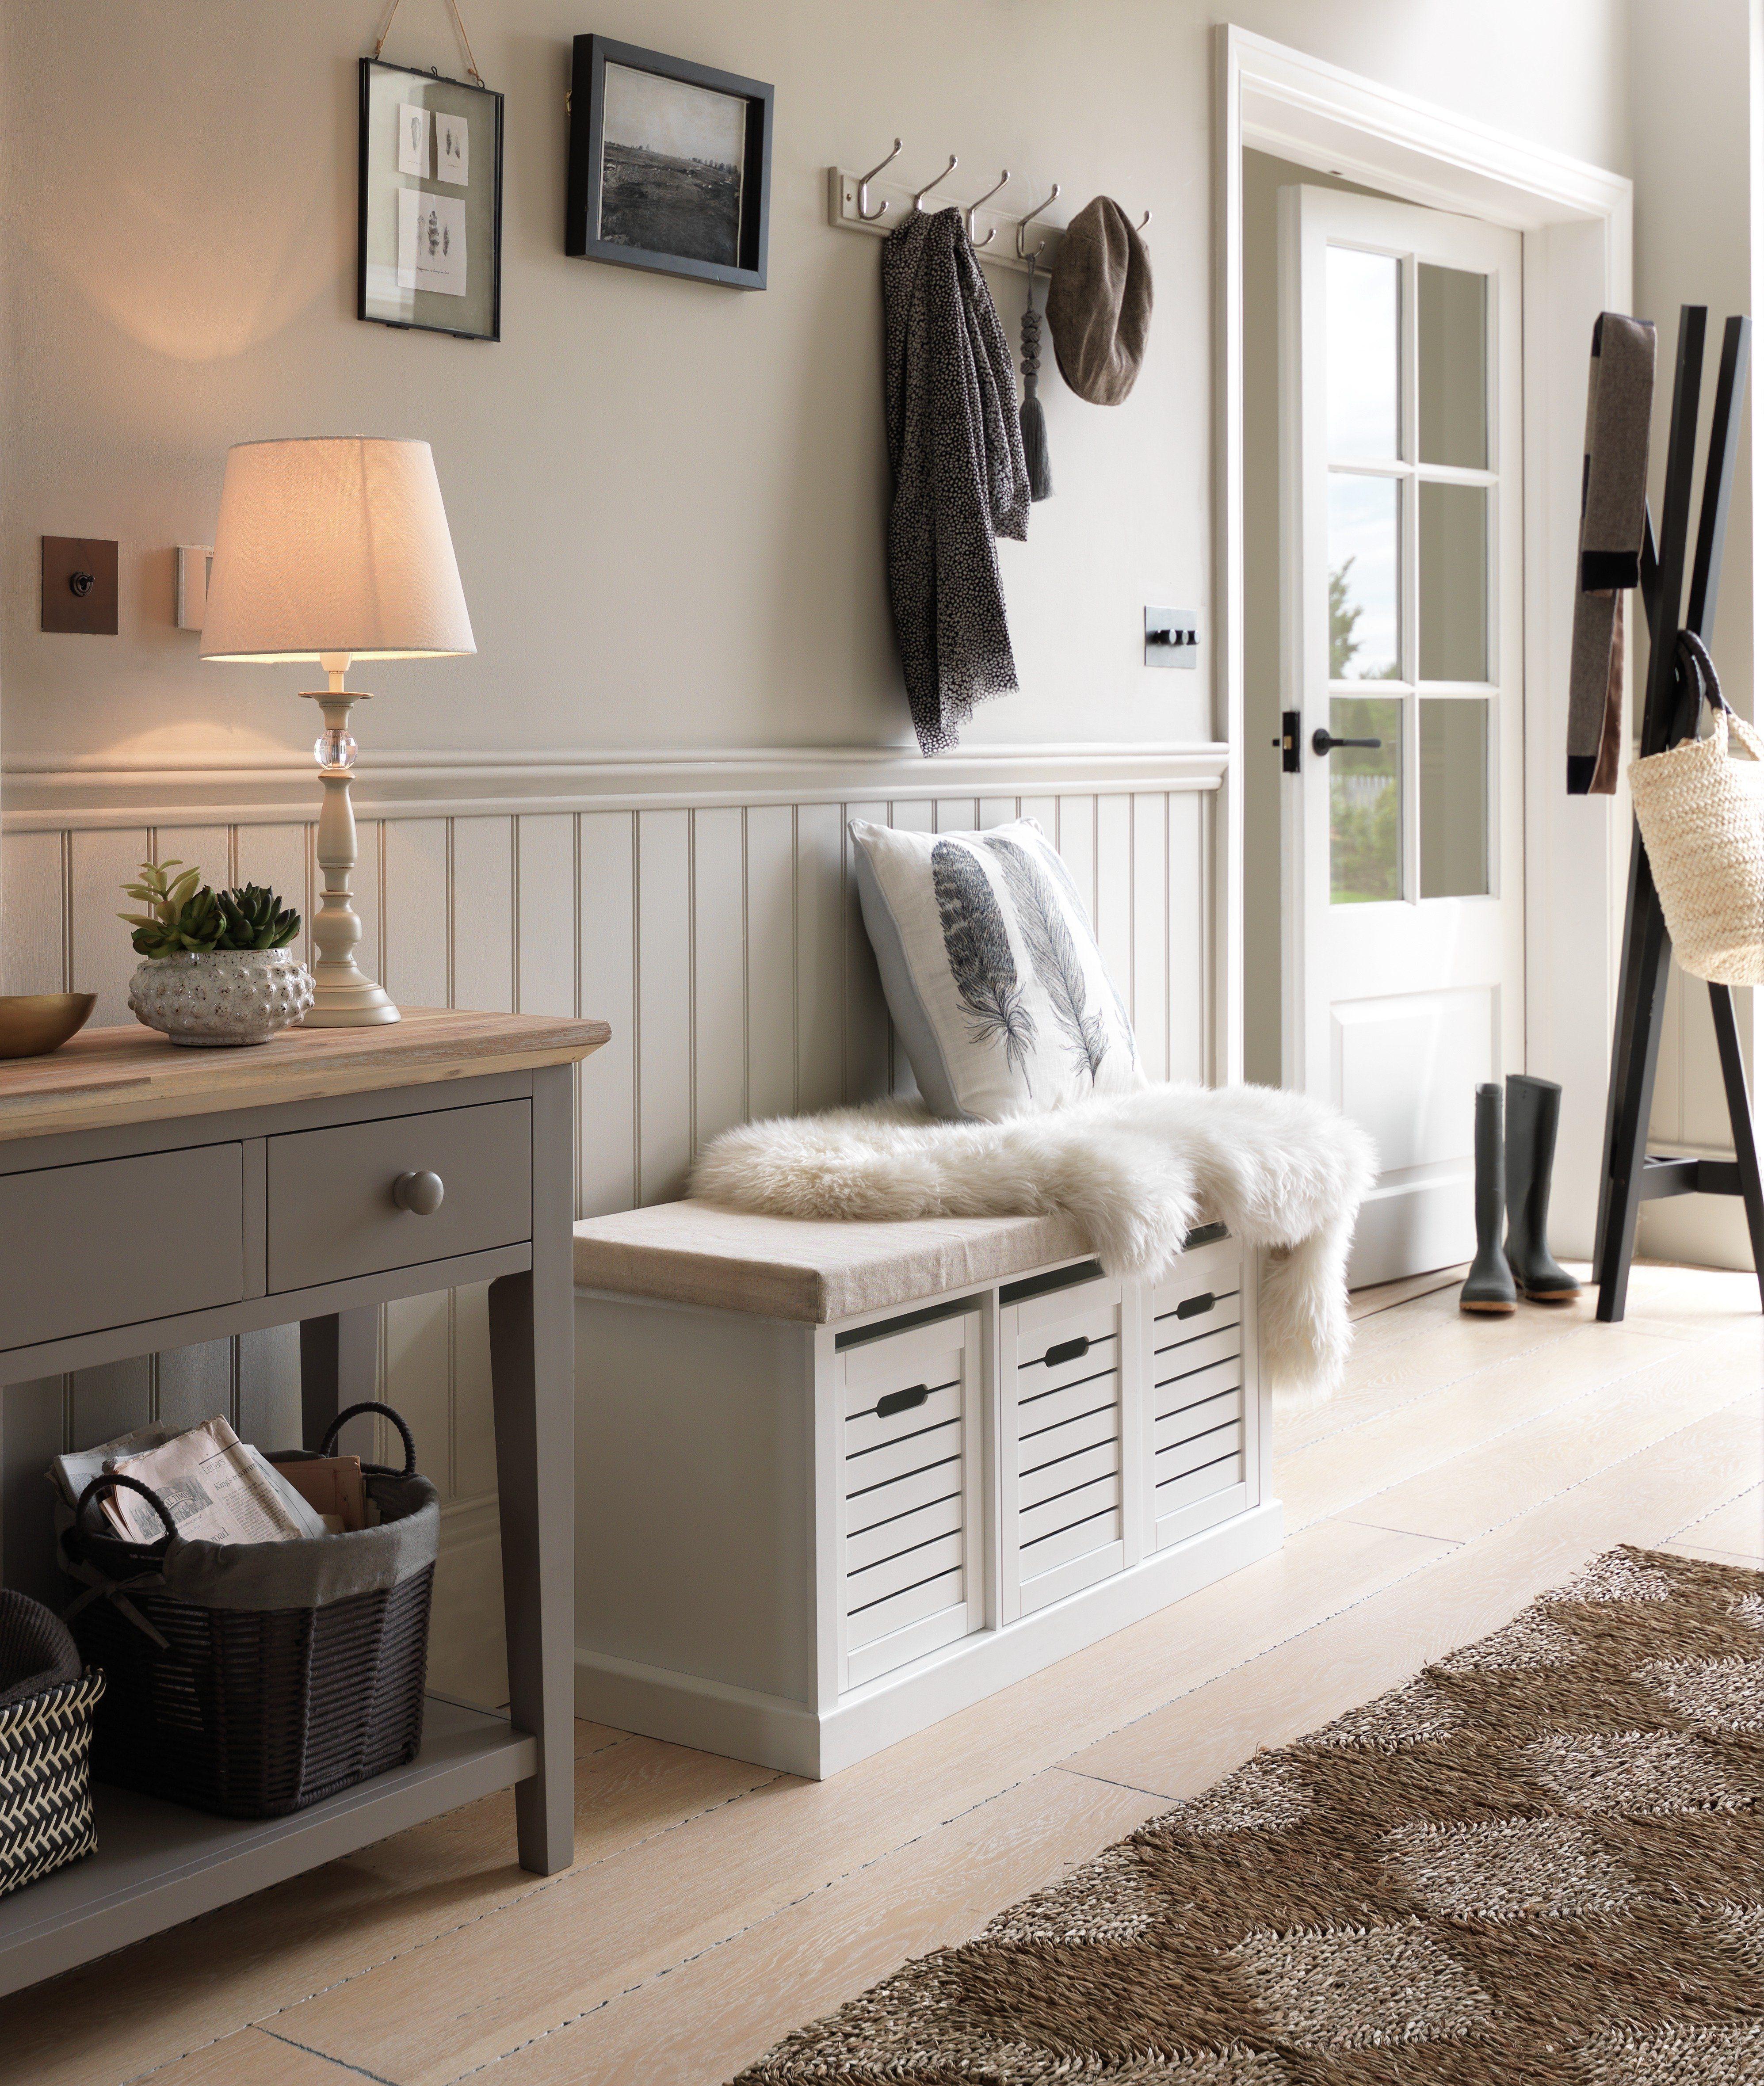 Prime Home Hereford Storage Bench White In 2019 Hallway Theyellowbook Wood Chair Design Ideas Theyellowbookinfo